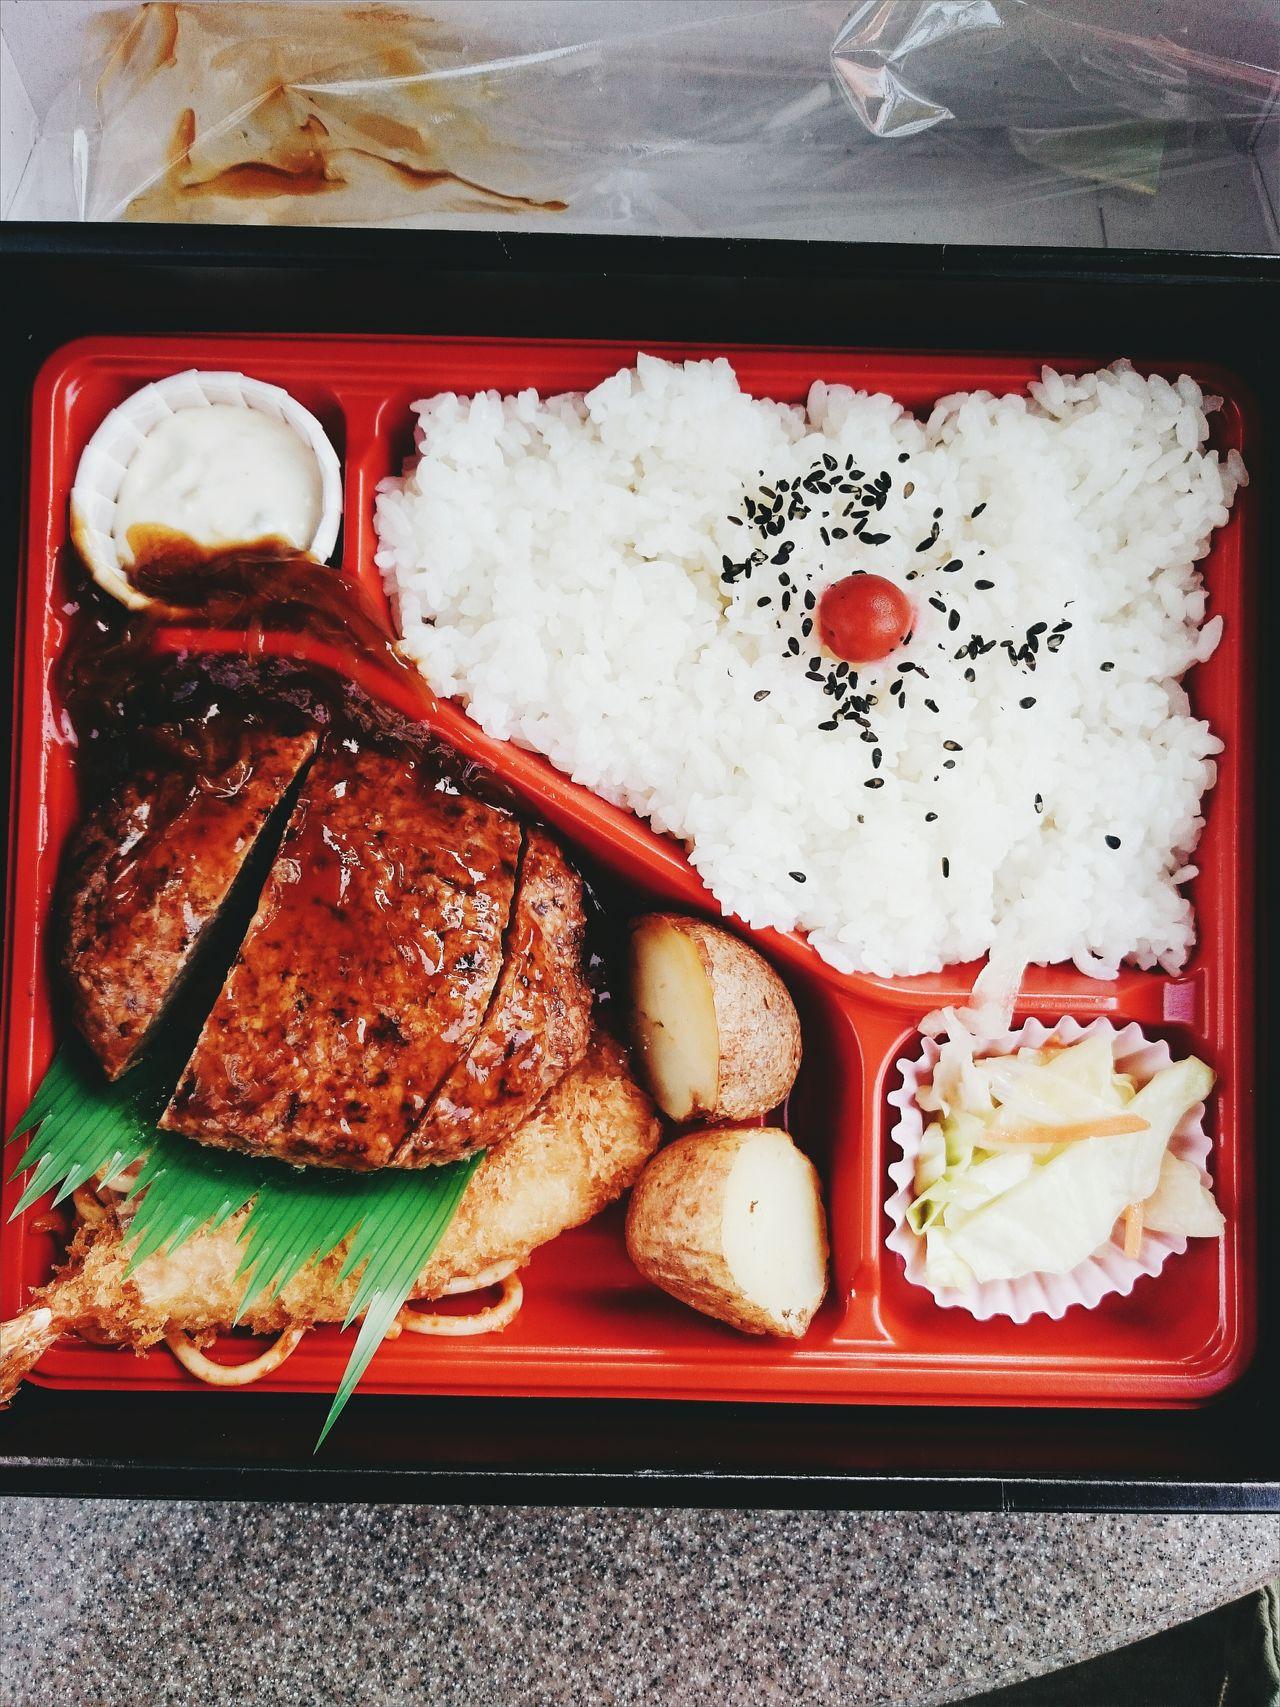 Japan Japanese Food Bento Bentobox Lunch Lunch Box Food Hamburg Hamburger Rice Picnic Directly Above Day Close-up Potato